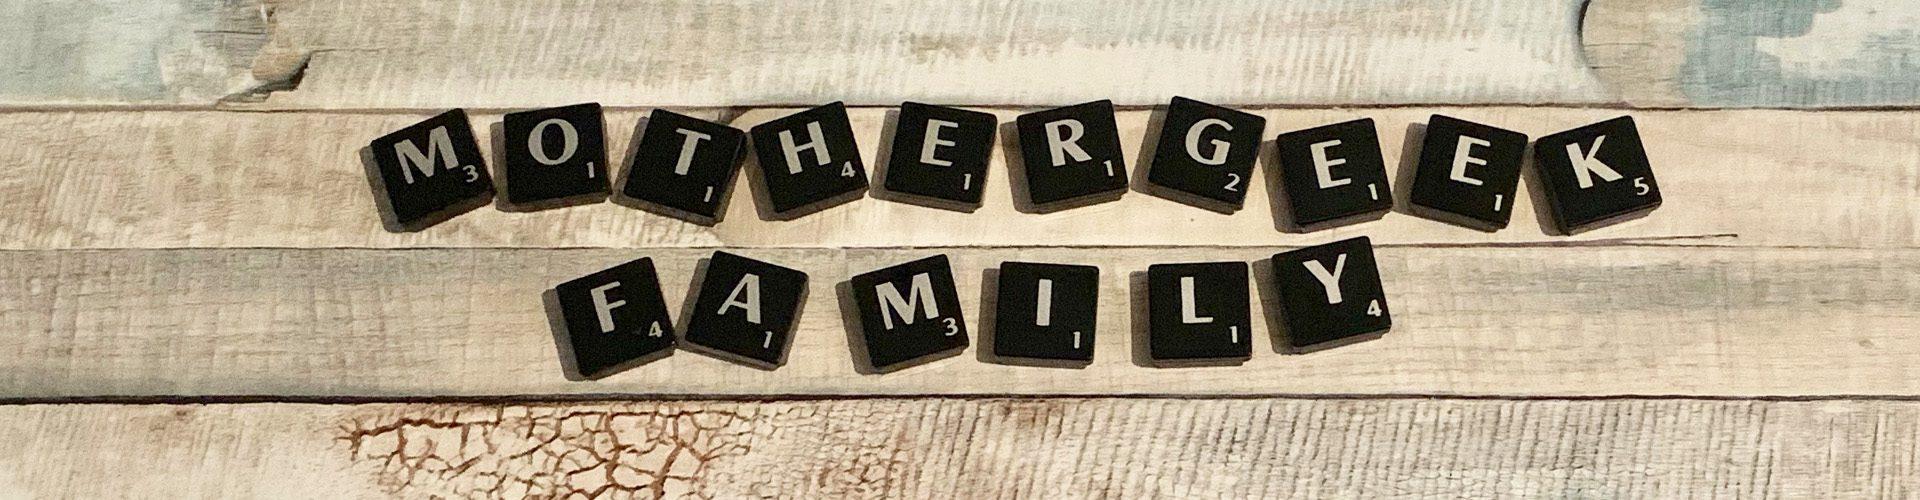 MotherGeek Family